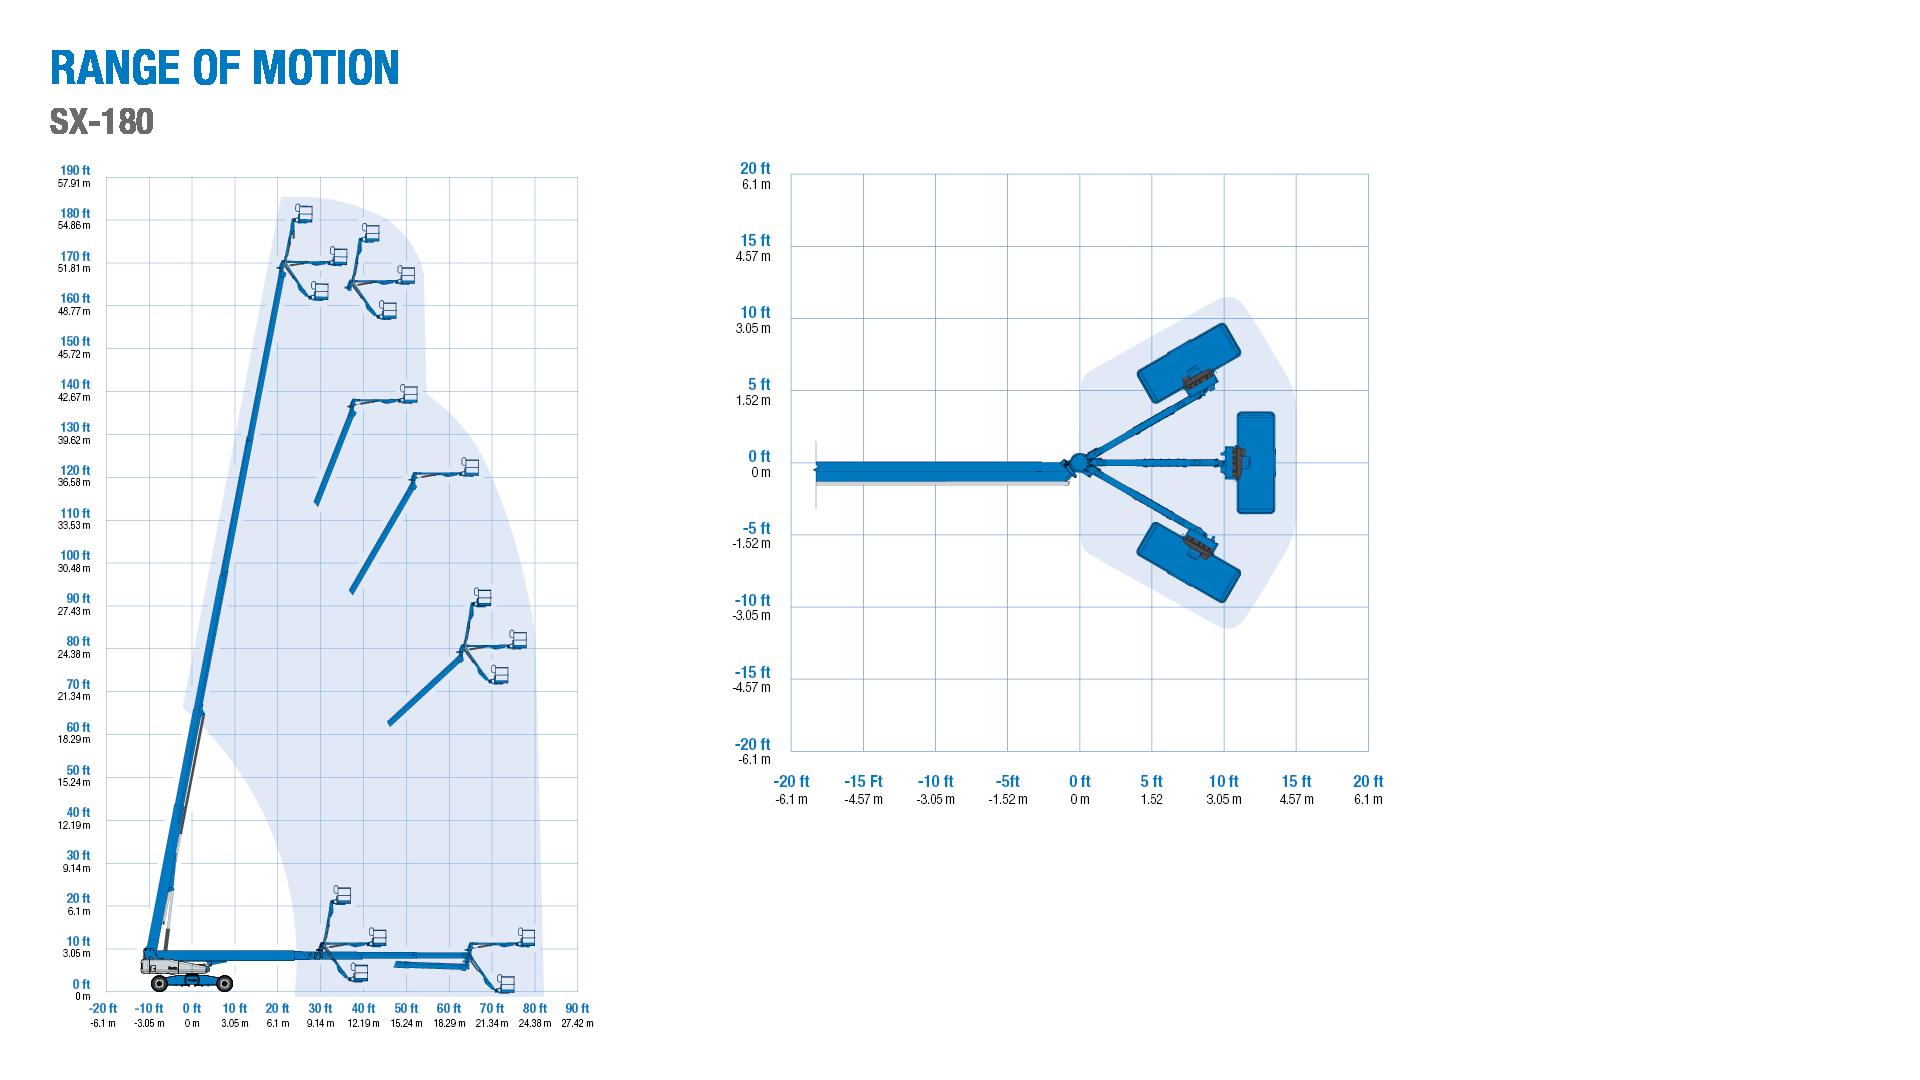 Range of motion - Genie SX-180 telescopic boom lift